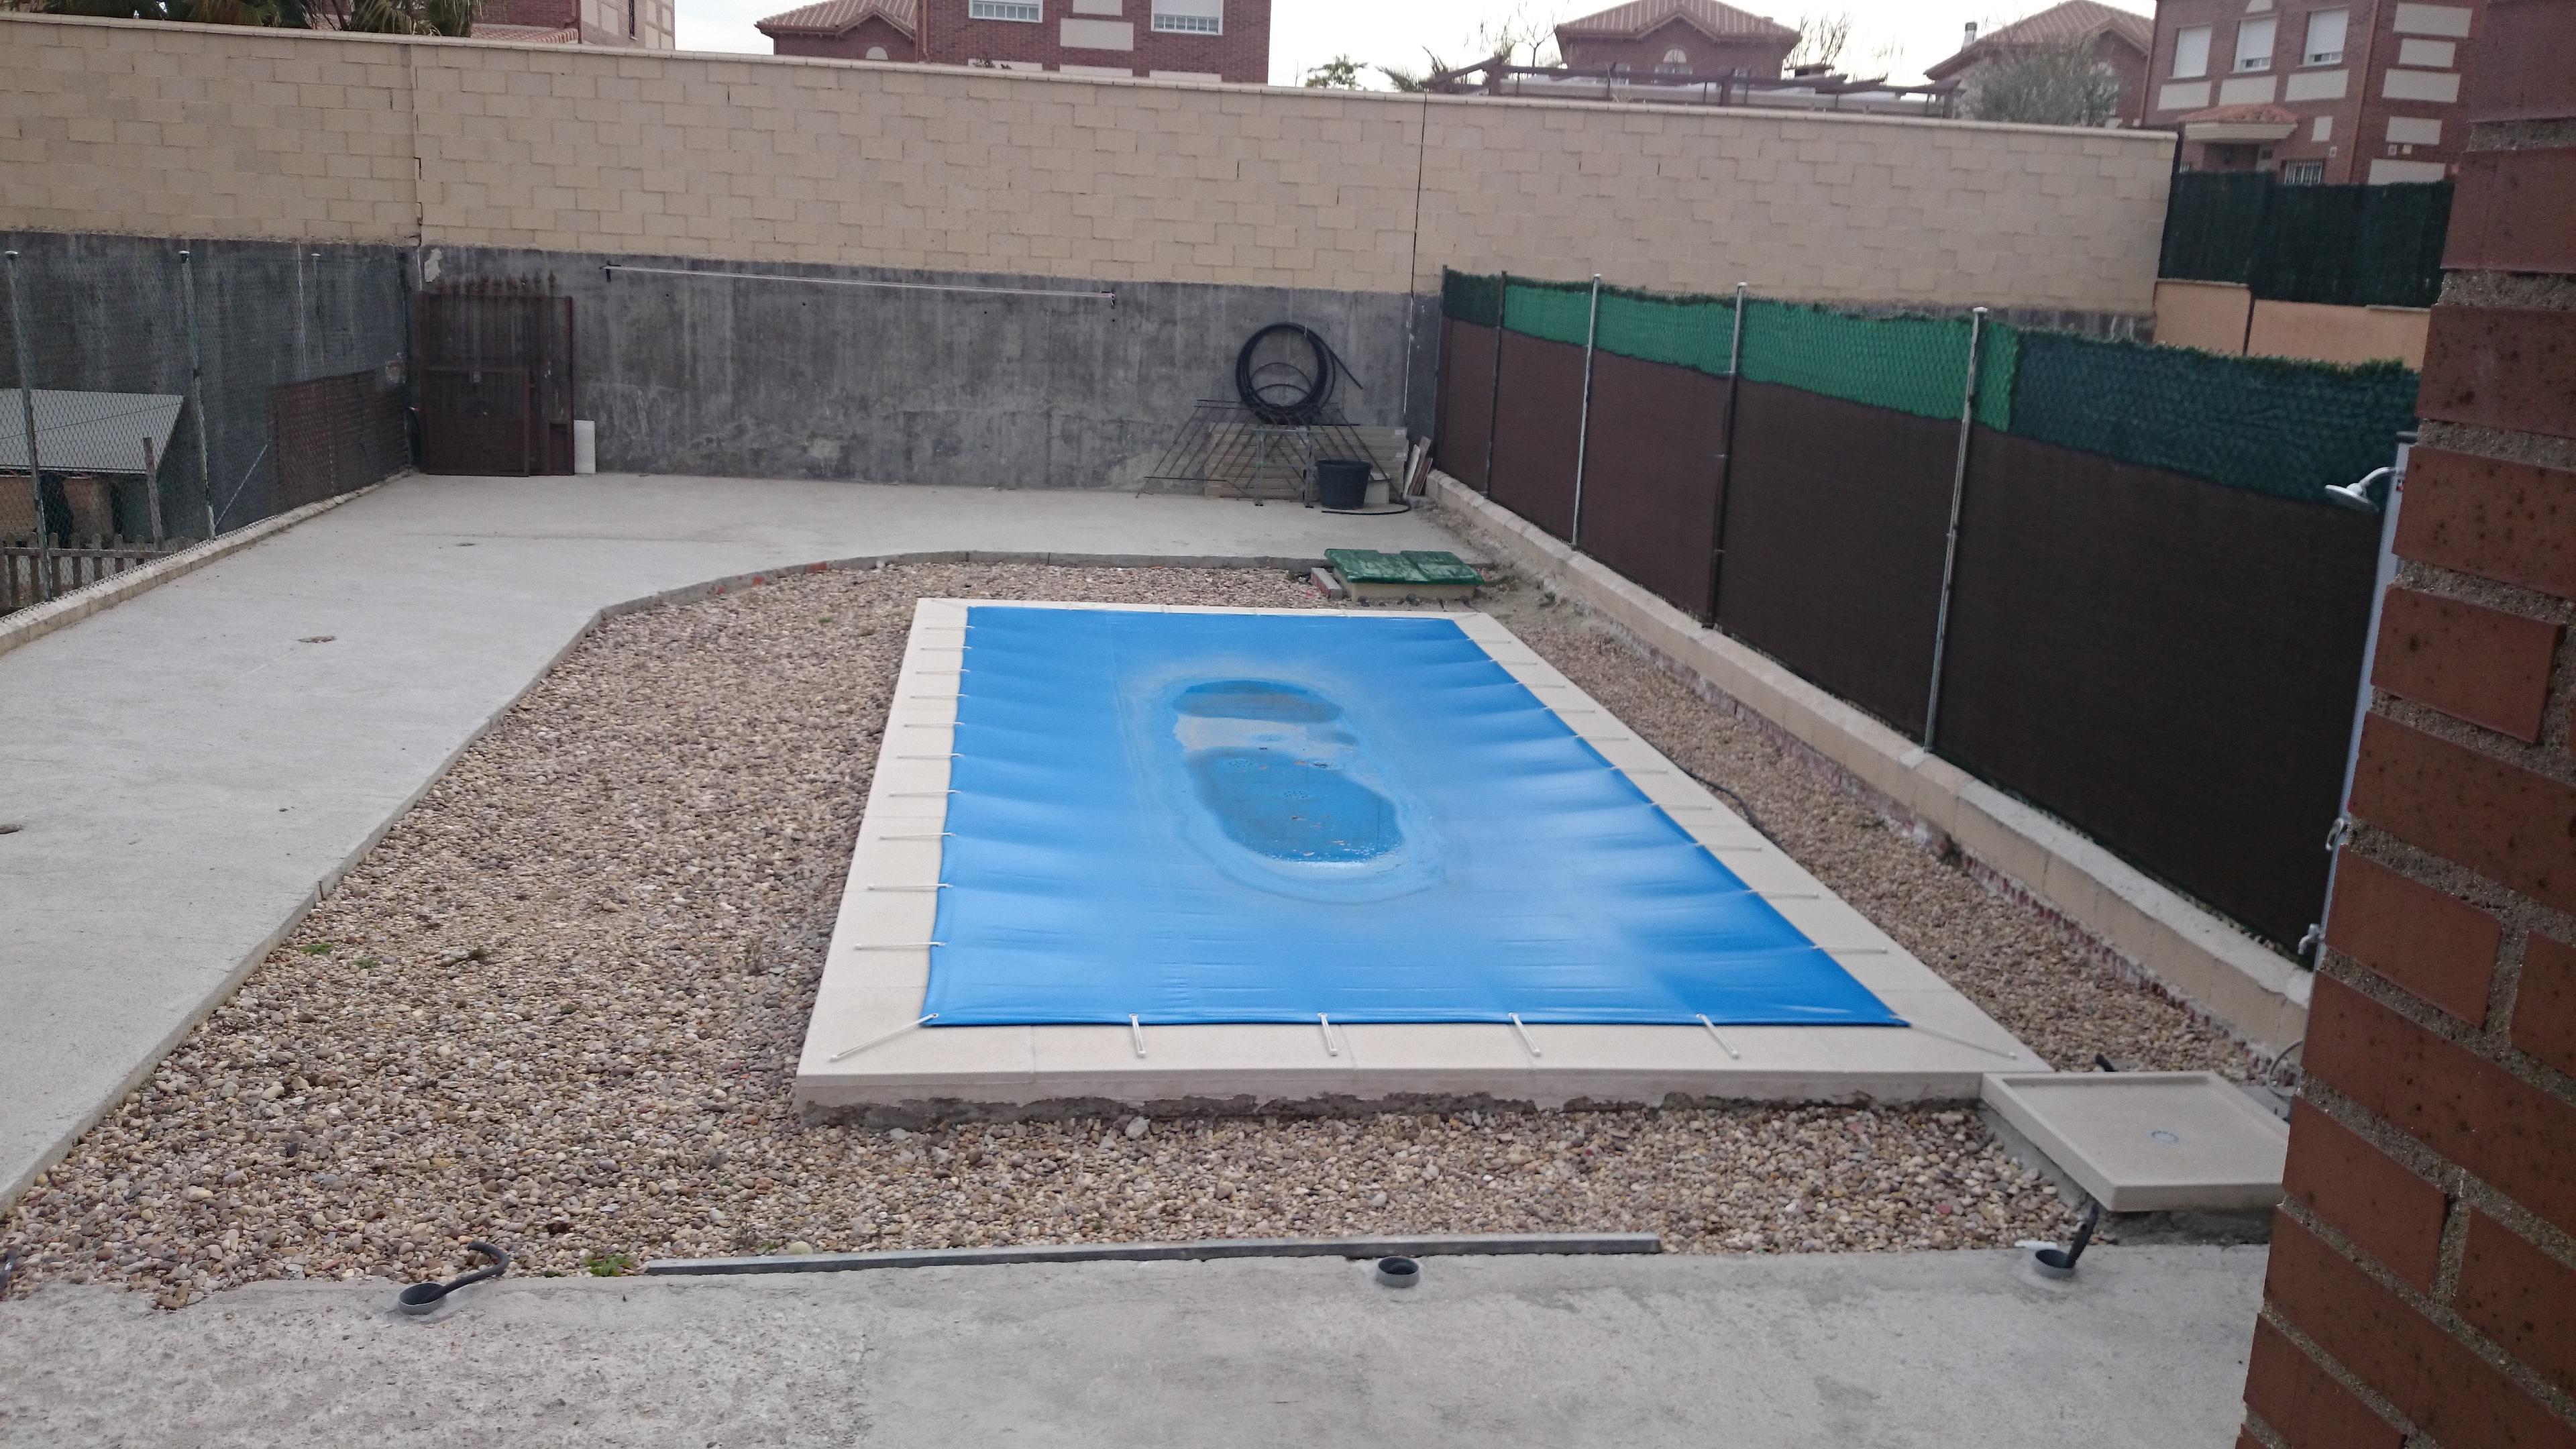 Cobertores piscinas de obra en madrid t 91 808 80 60 for Piscinas municipales madrid 2017